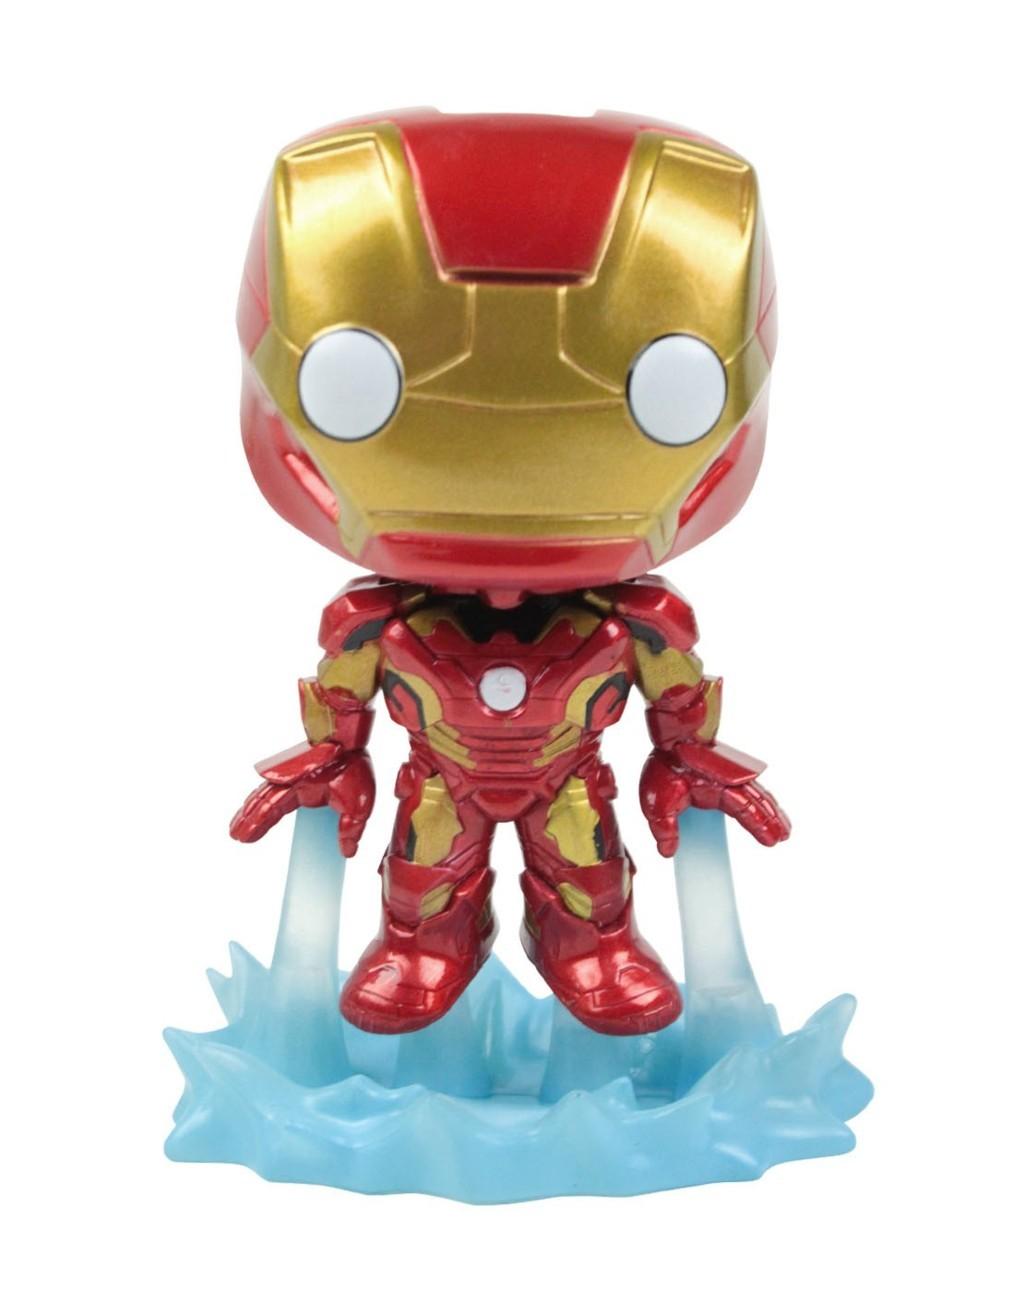 Imagem - Iron Man / Homem de Ferro - Funko Pop Avengers: Age of Ultron cód: CC37